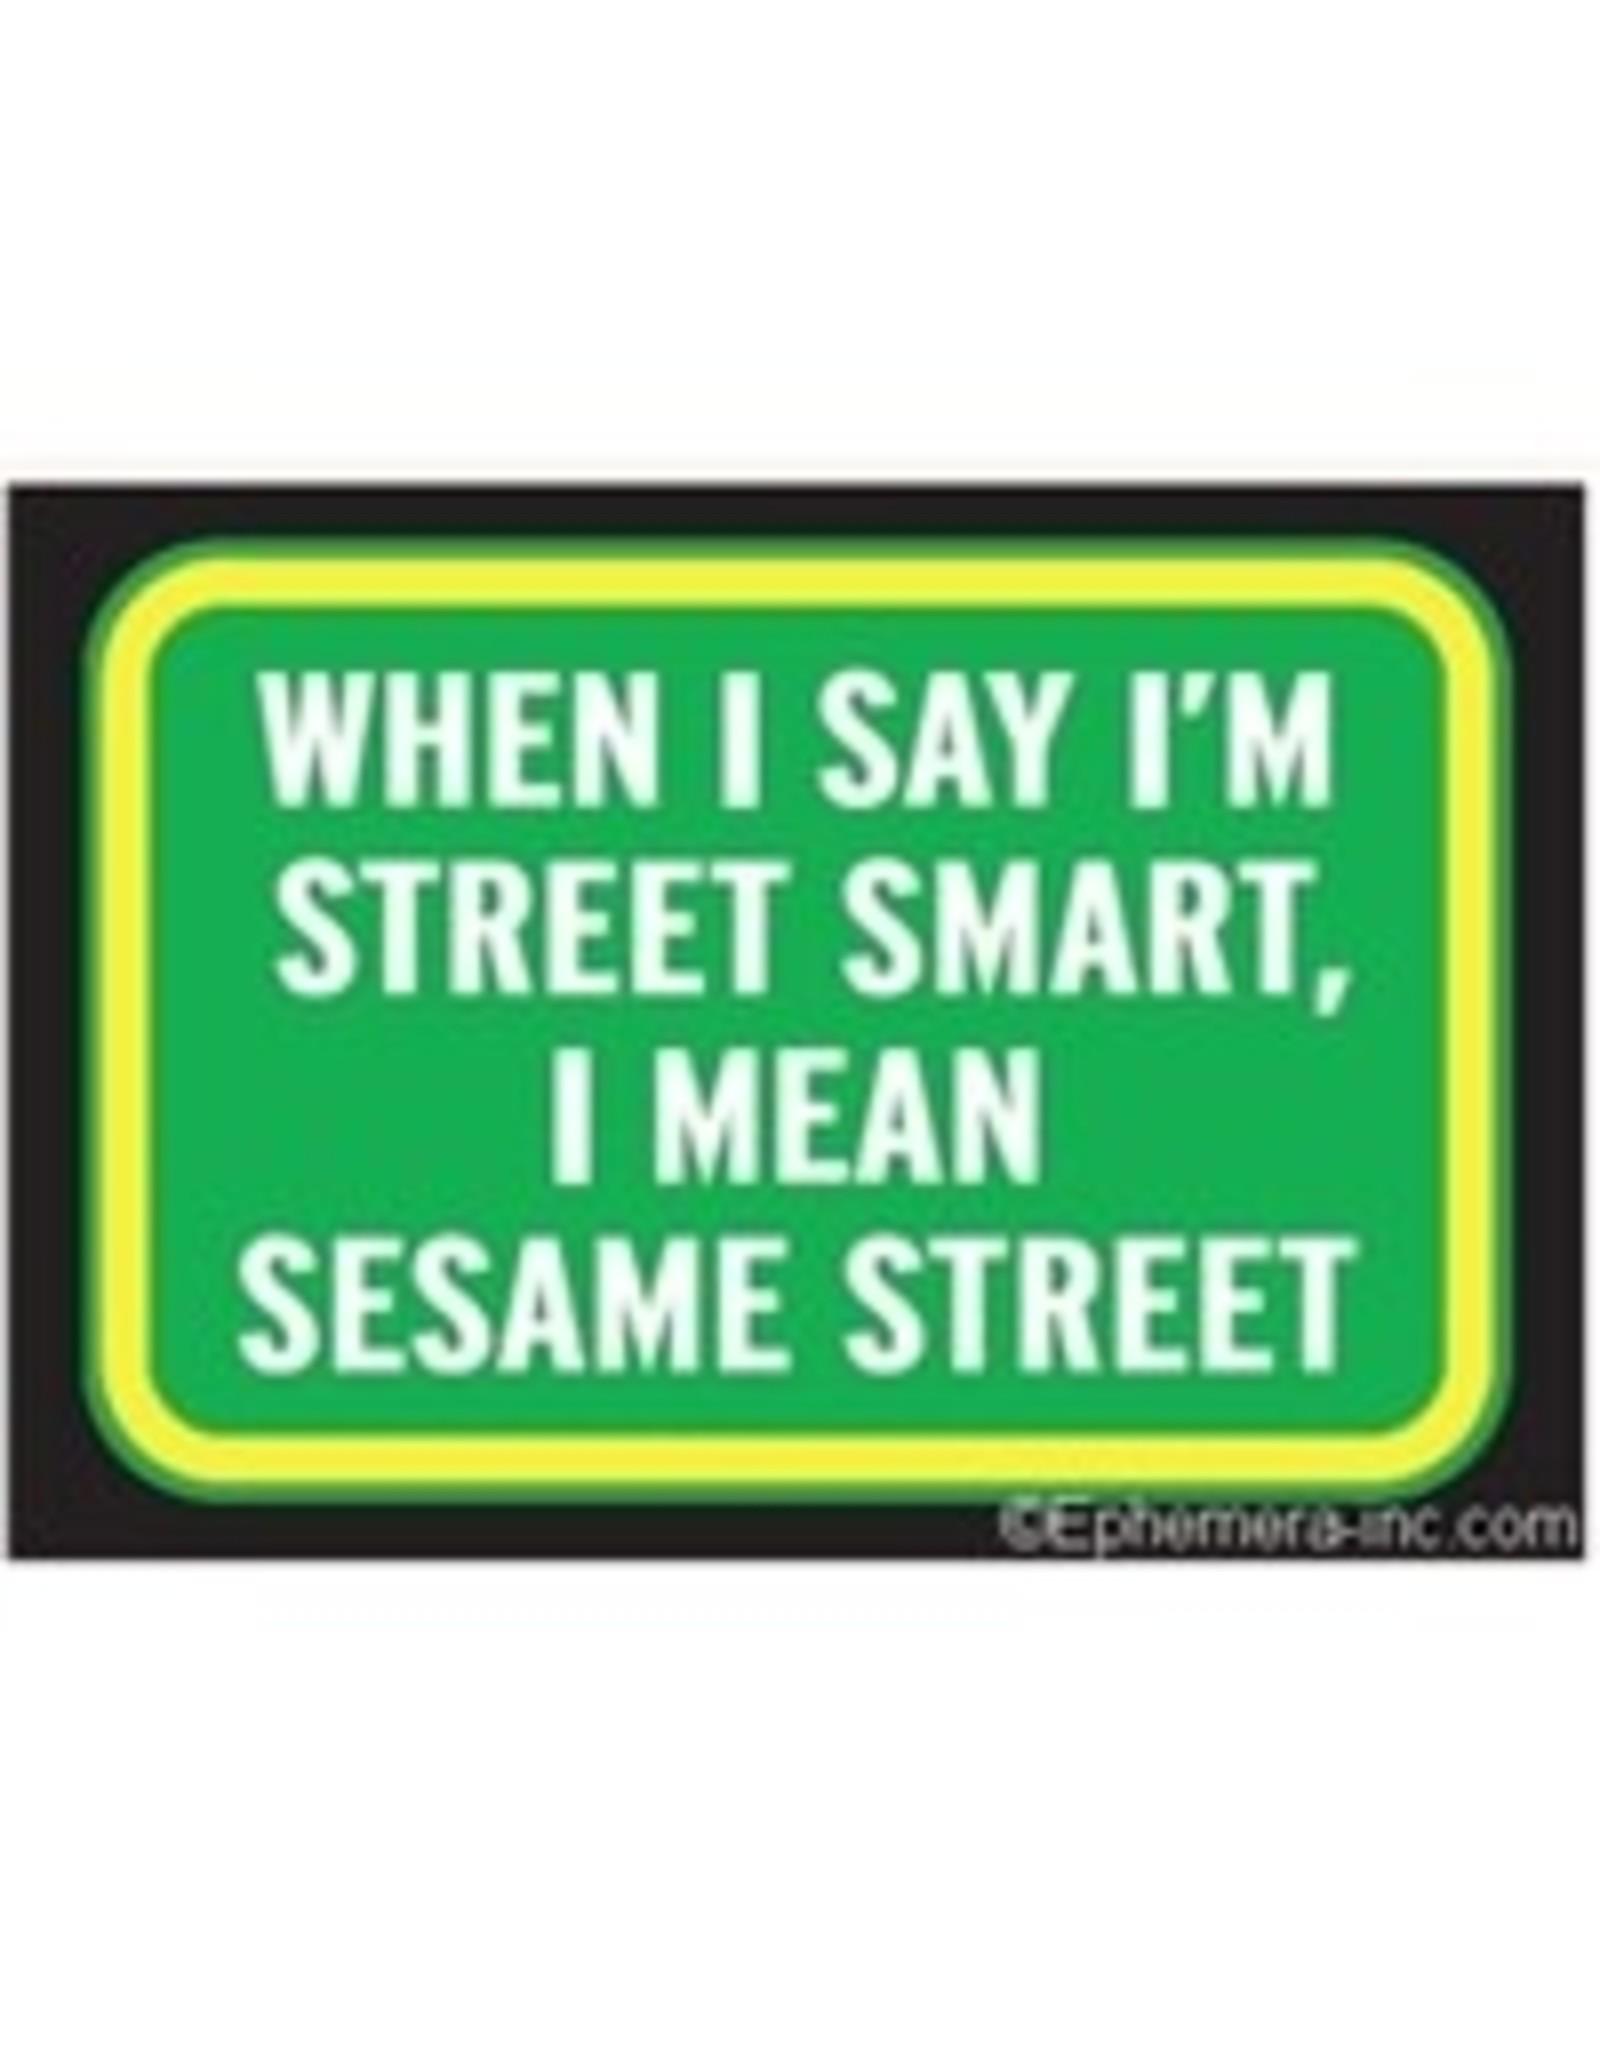 Magnet - When I Say I'm Street Smart, I Mean Sesame Street